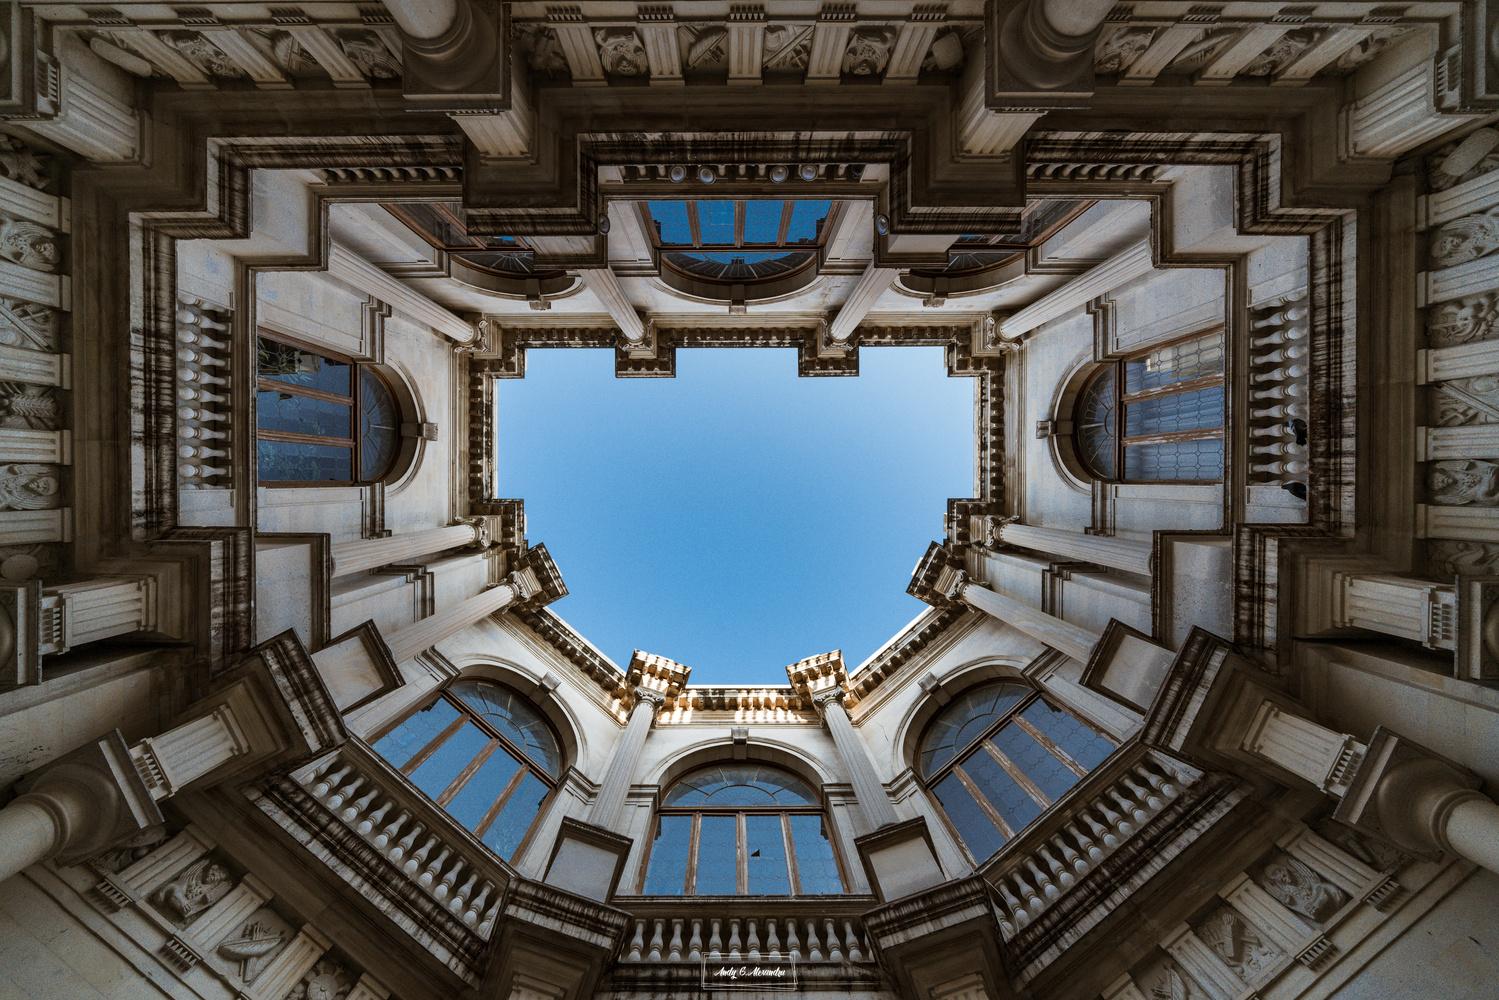 The old cityhall of Heraklion by Ghita Alexandru